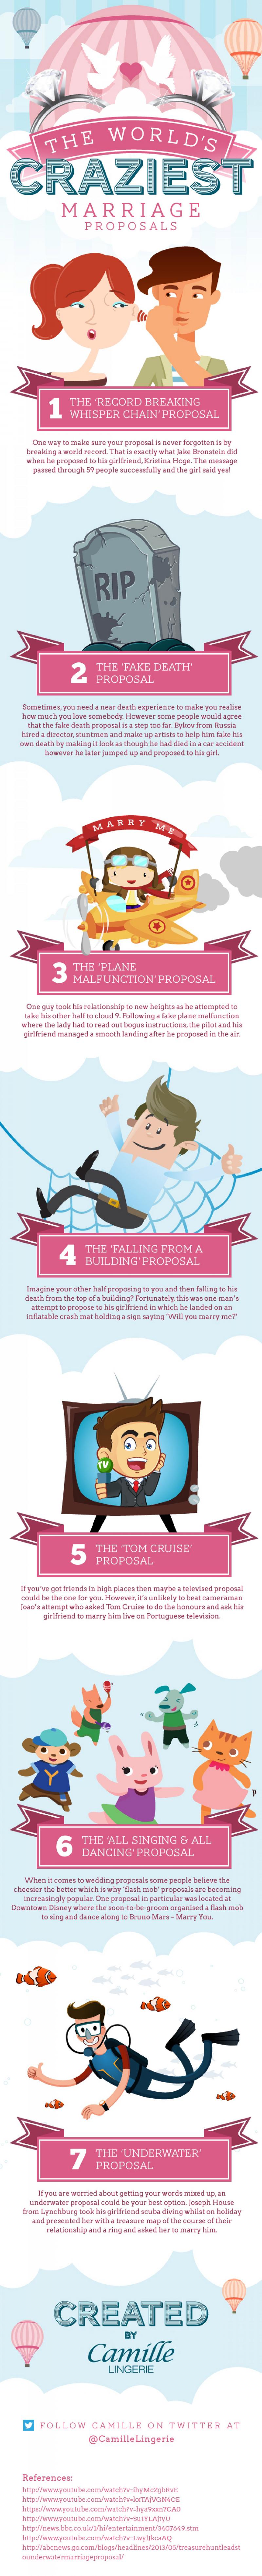 Crazy Marriage Proposals